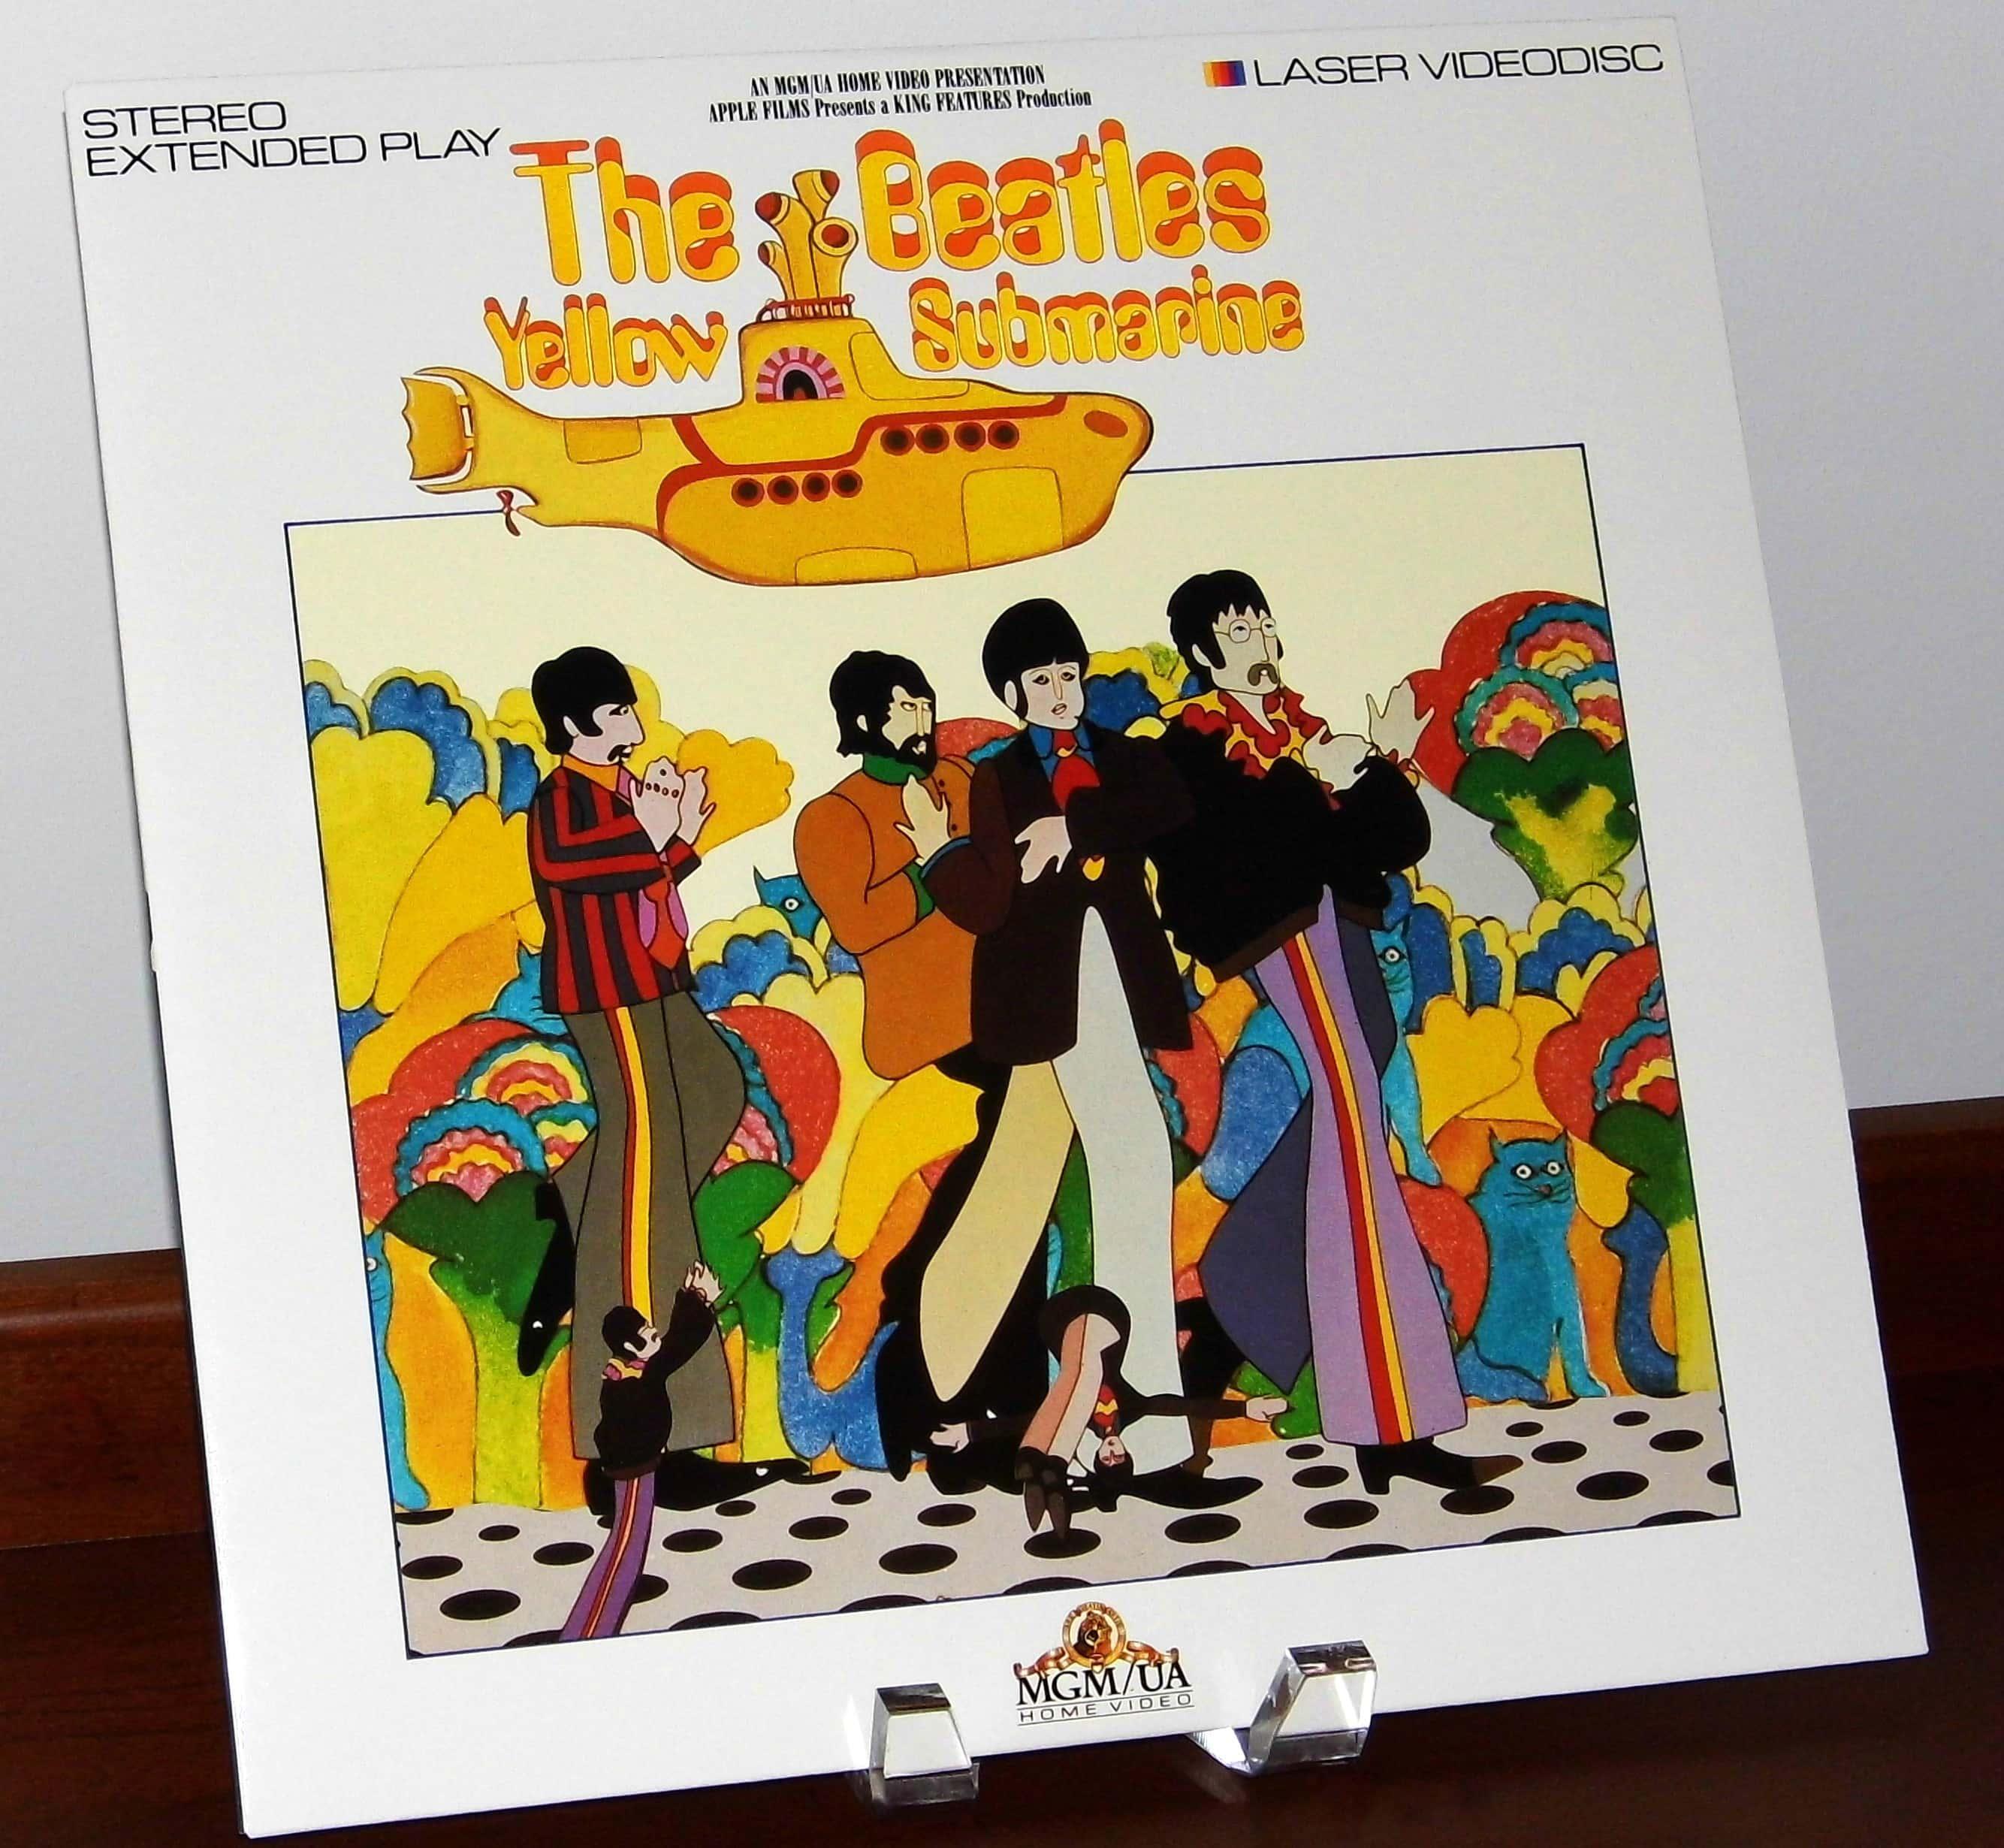 Ringo Starr Facts